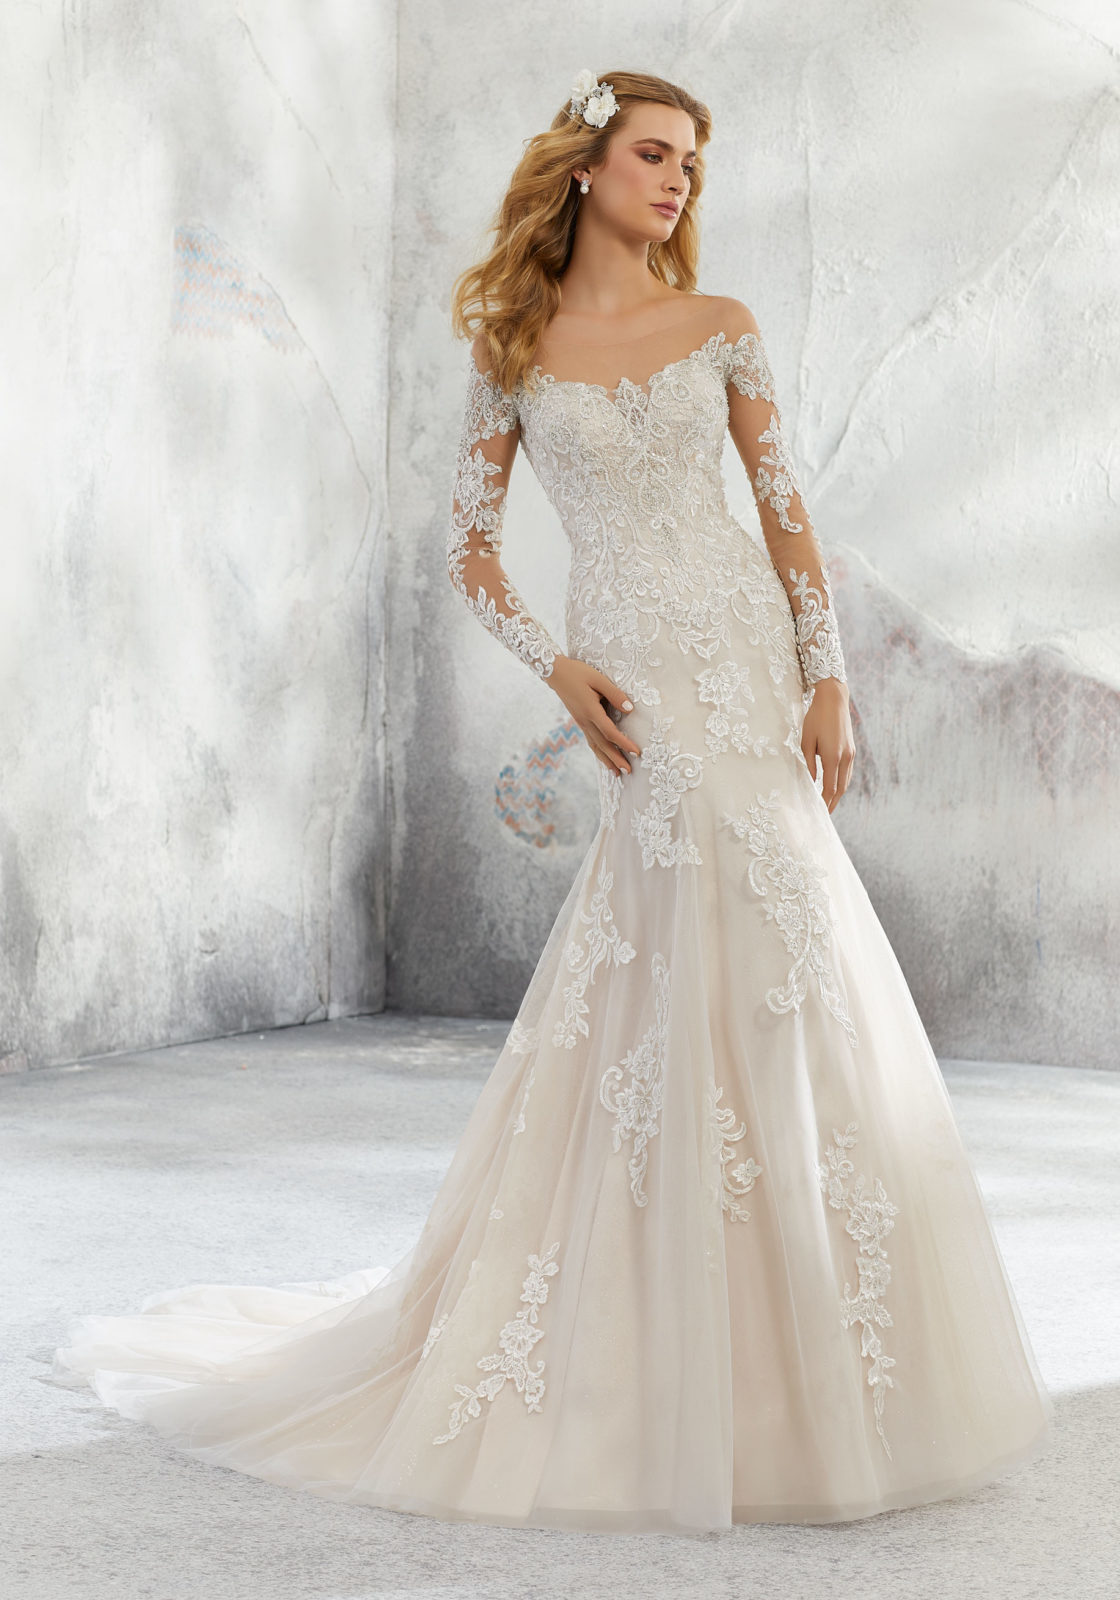 e128ca77339 off Shoulder Bridal Gowns Long Sleeves Lace Wedding Dresses 2019 L8293